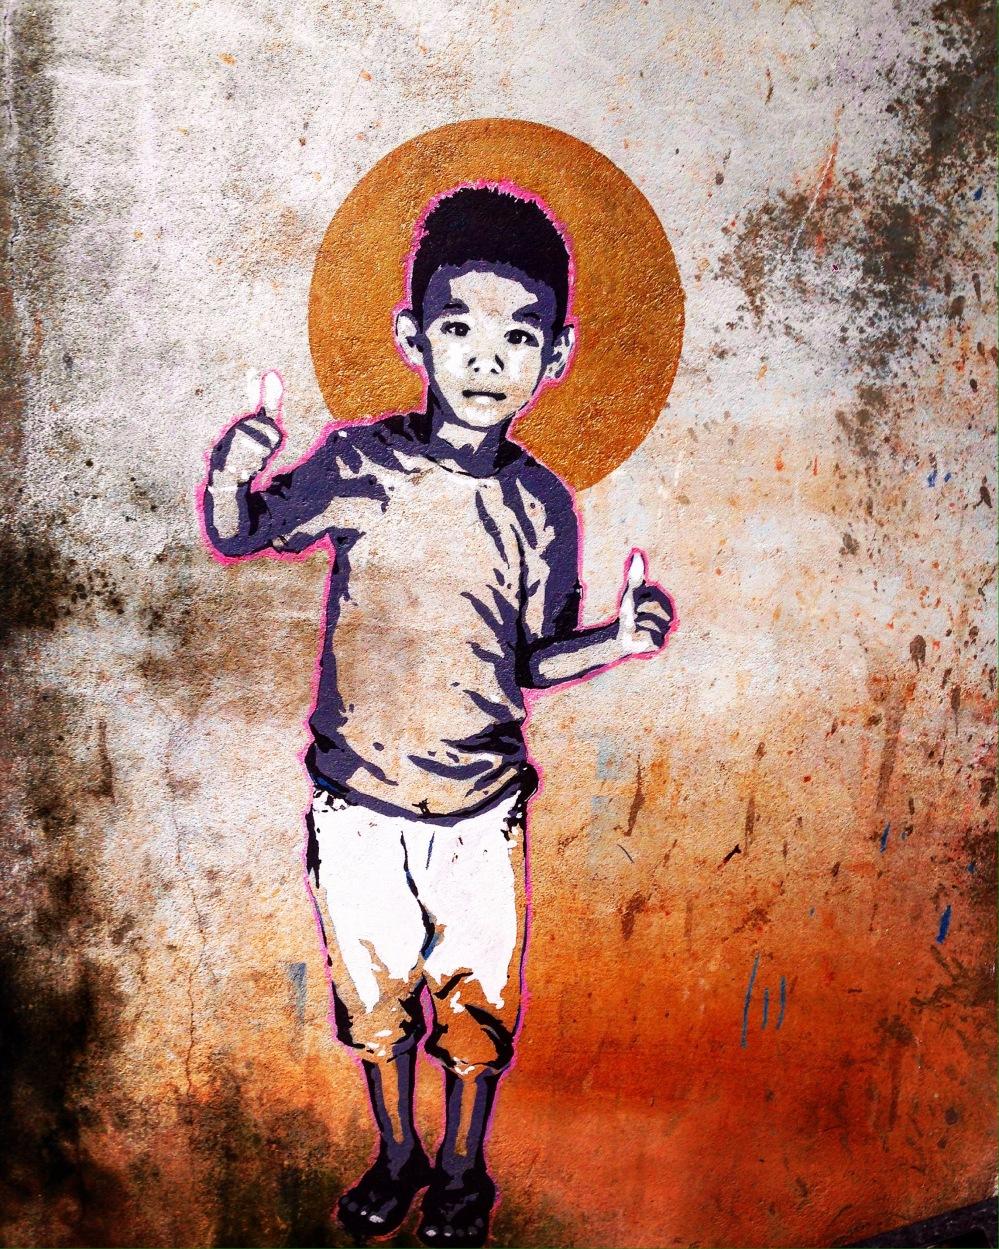 Nepal #streetart - Feel like a kid, enjoy life! - be artist be art